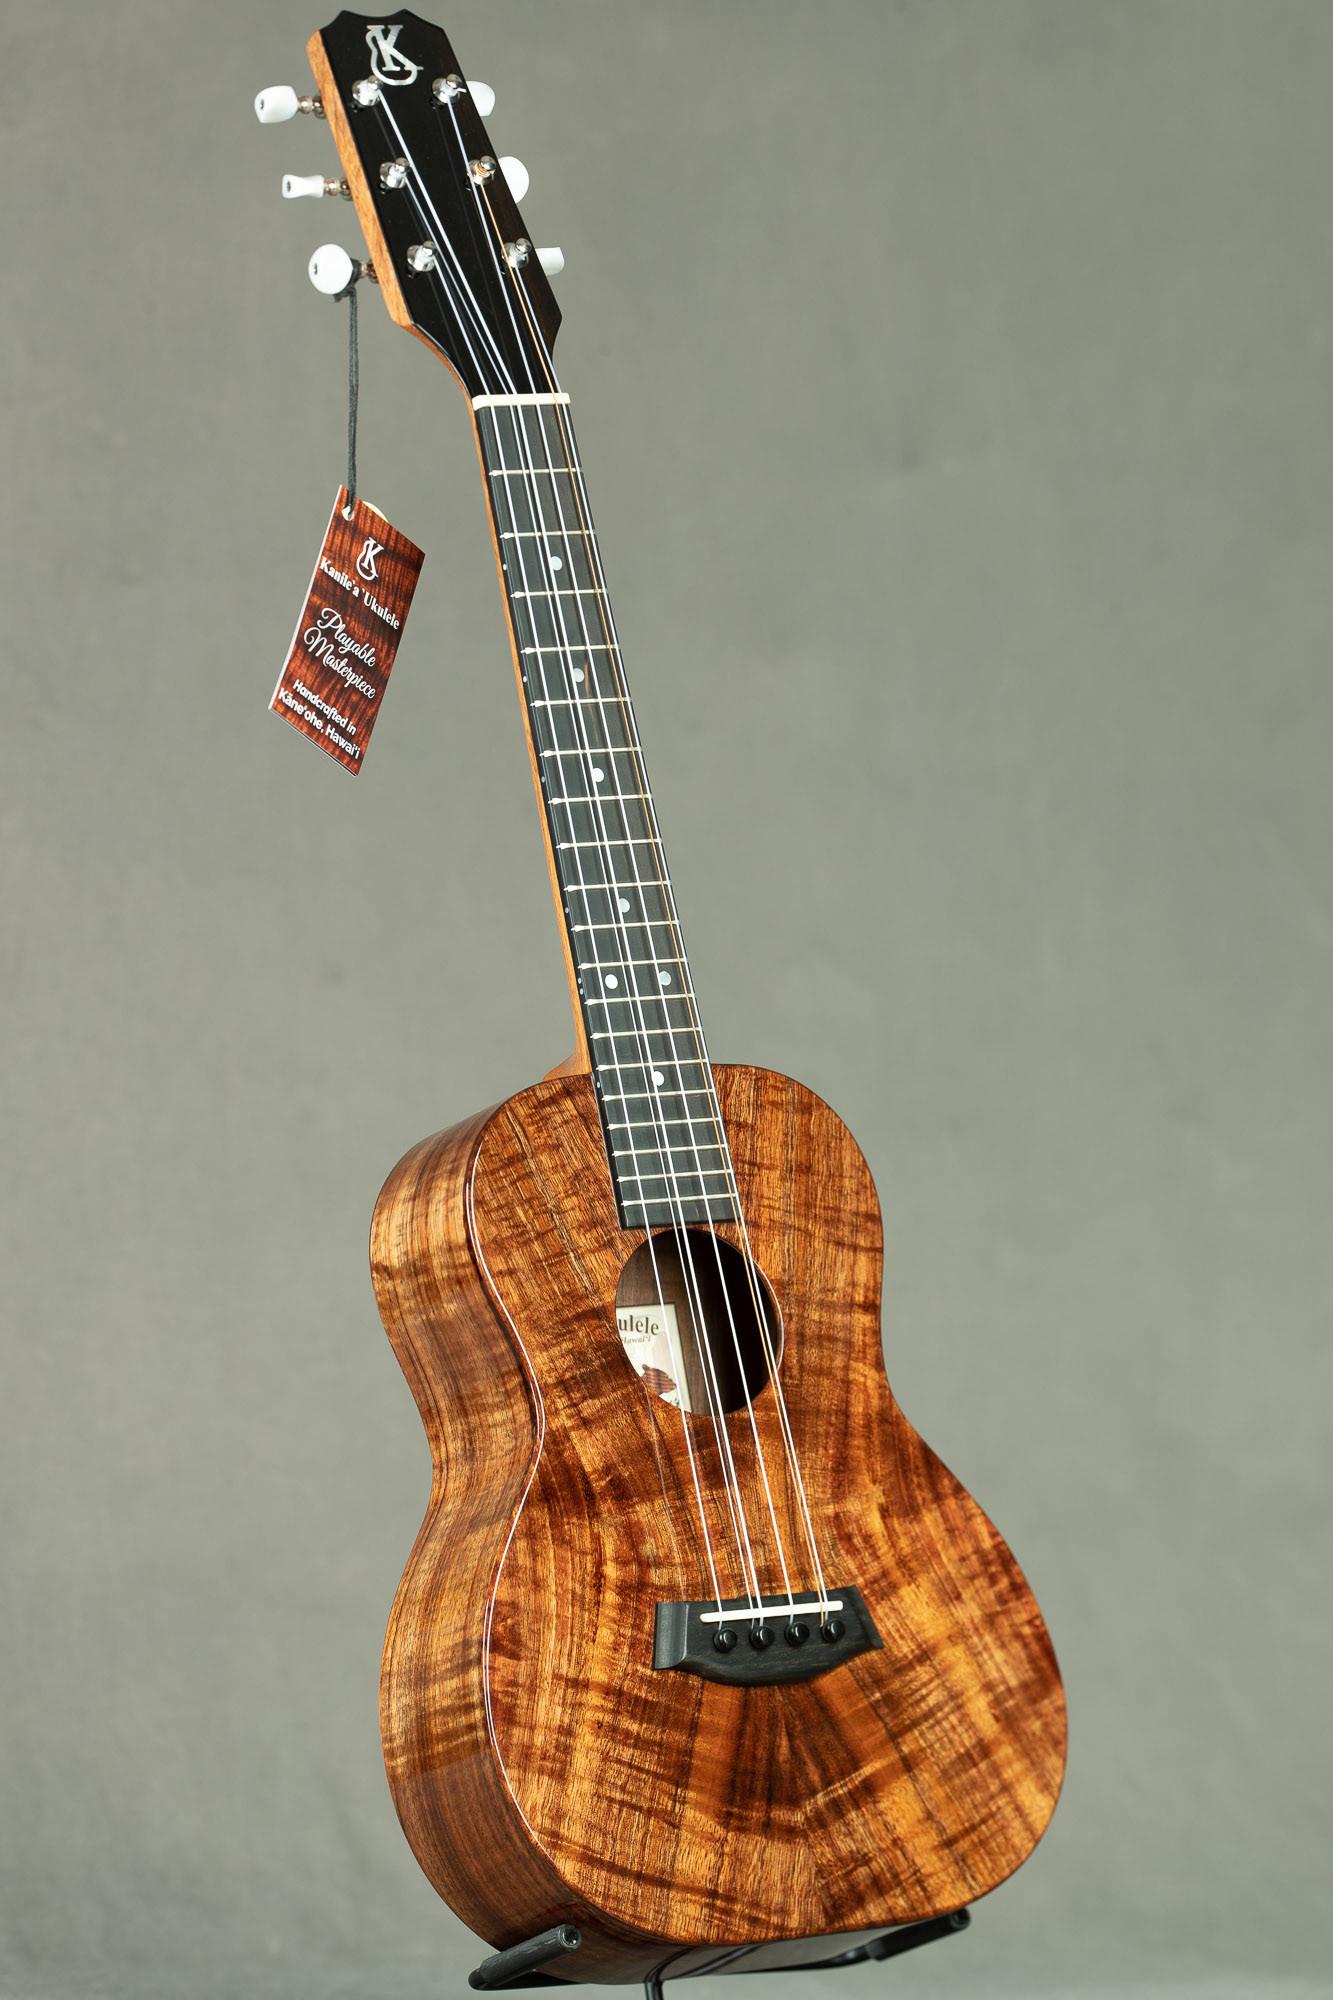 Kanile'a Koa 6-String Tenor (K-1 T6 Tru-R #24243)